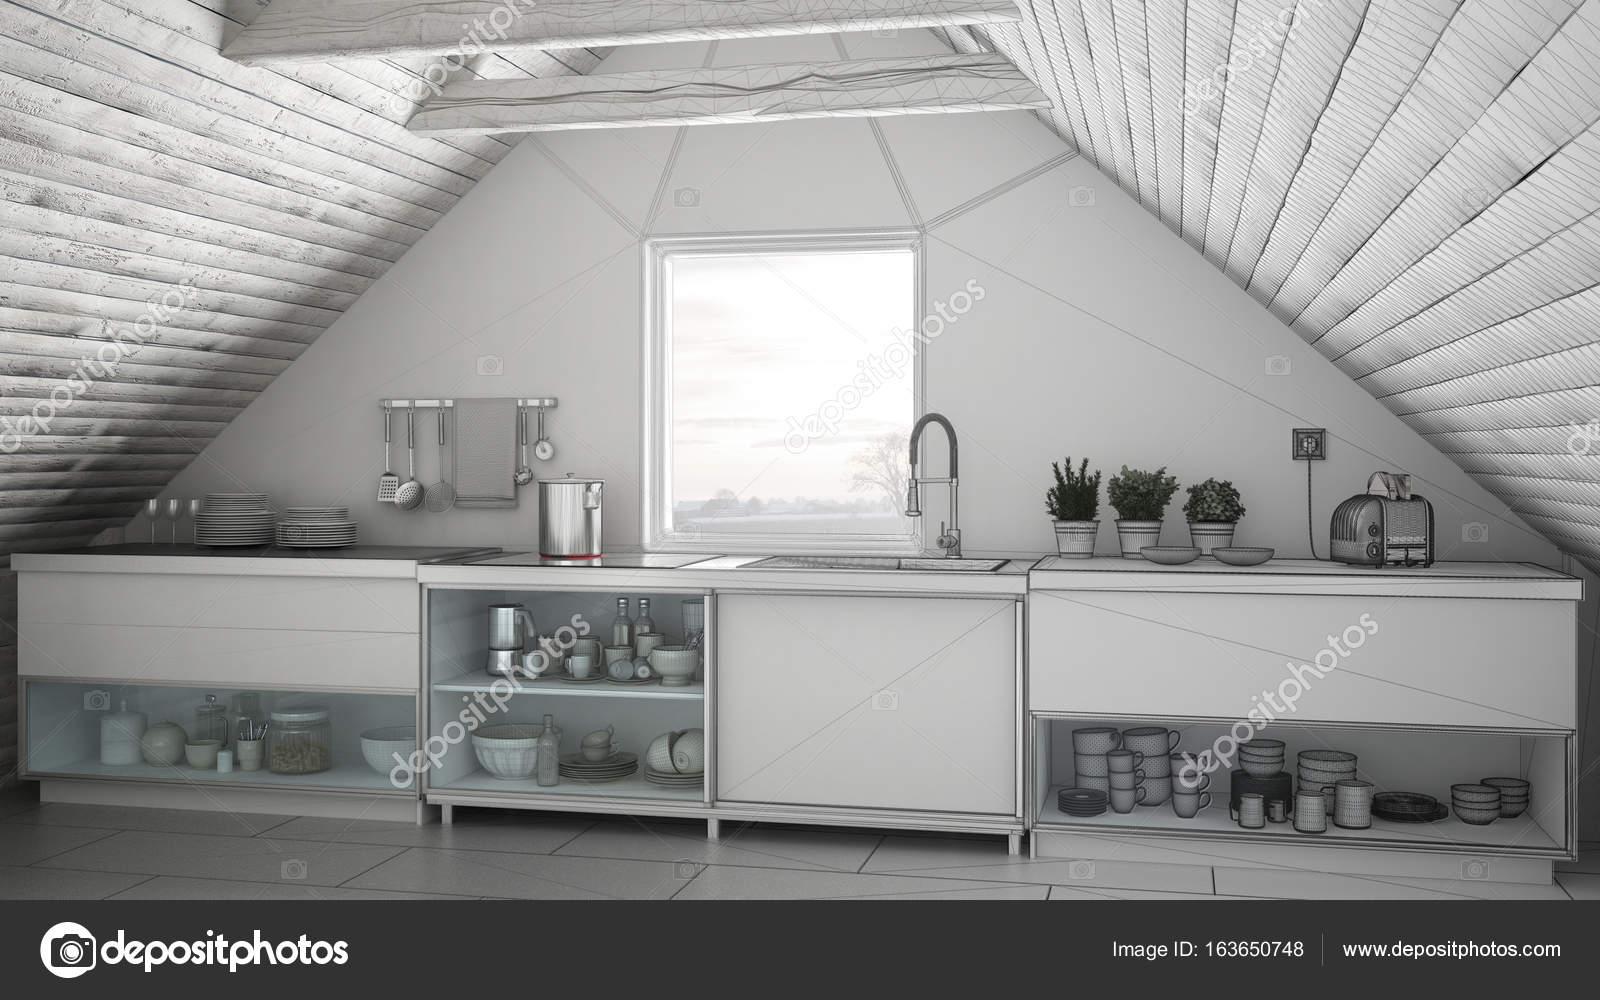 Cozinha Industrial Projeto Latest Cozinha Industrial Projeto With